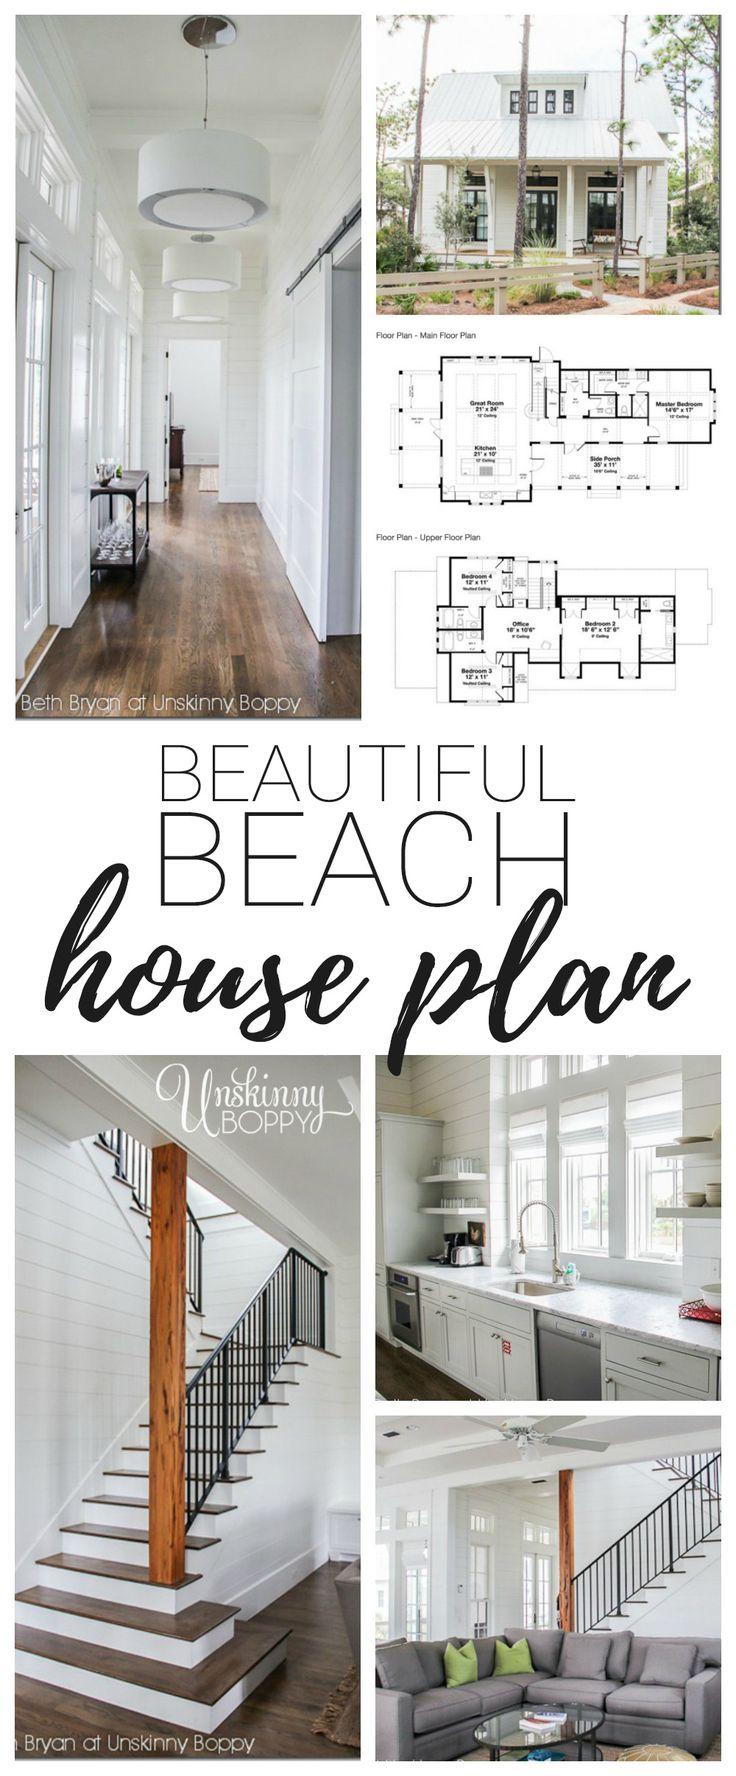 Best Beach house plans